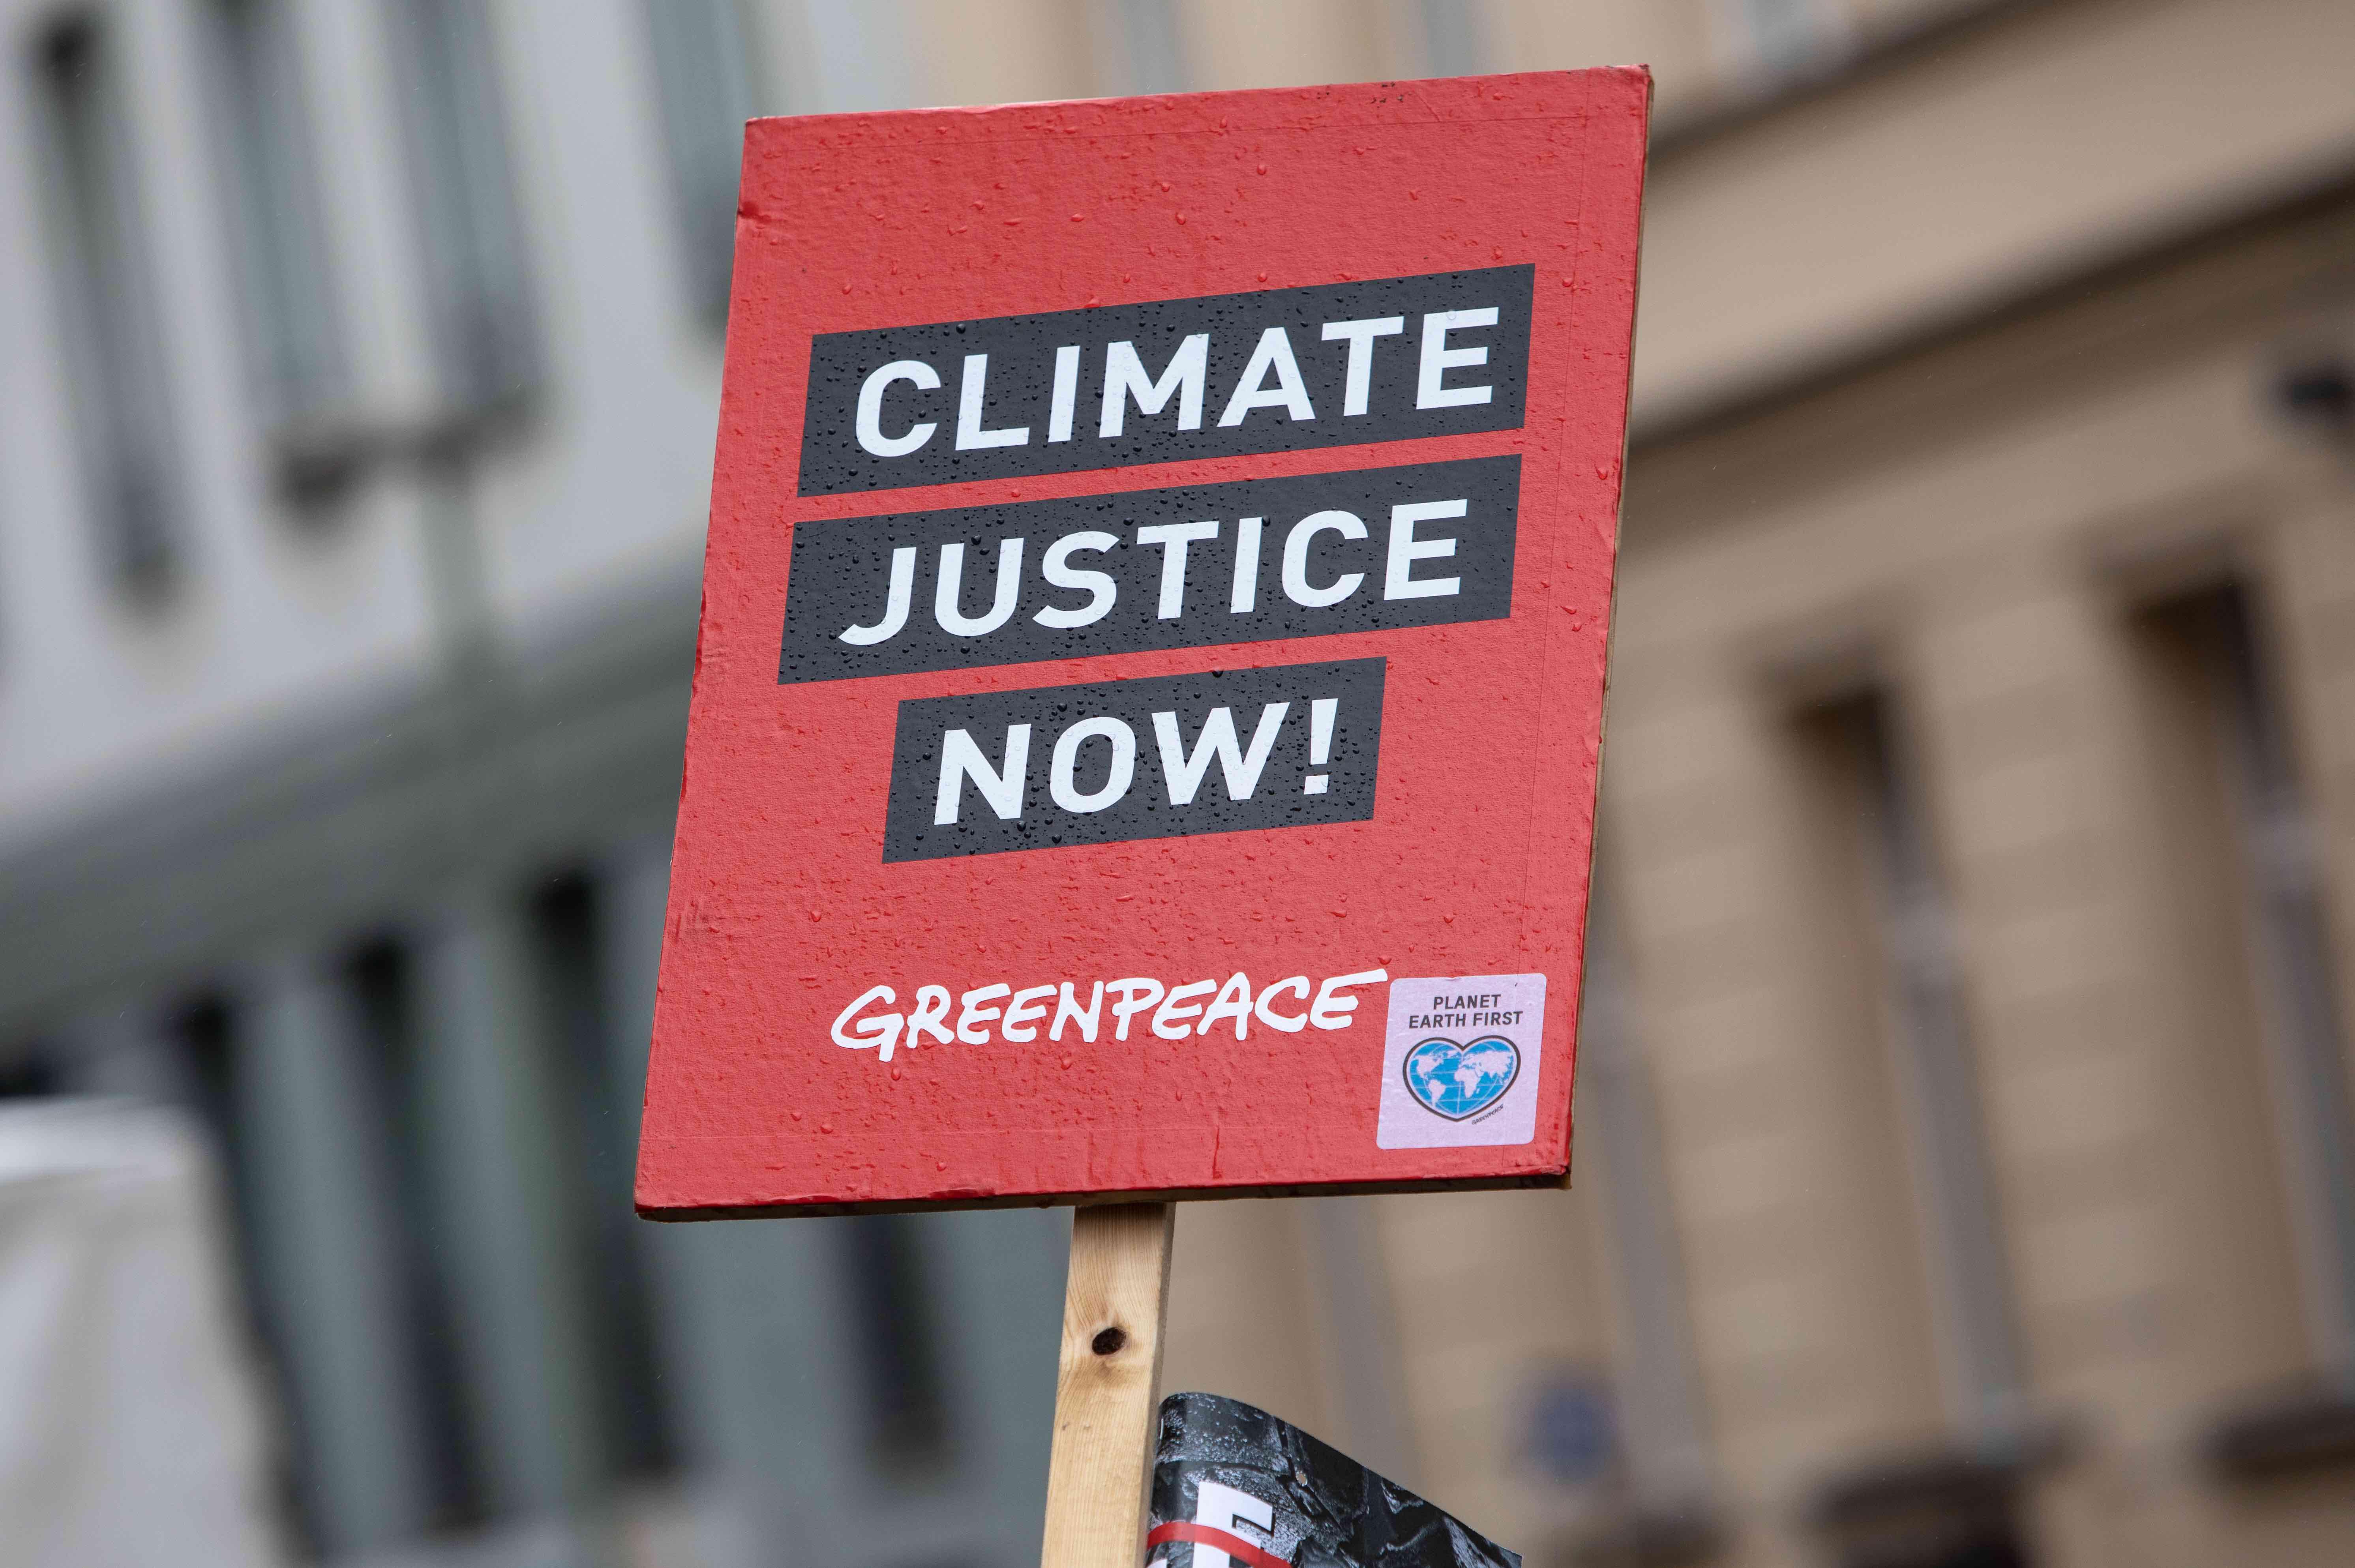 justicia-greenpeace-cambio-climatico-calentamiento-global-responsables